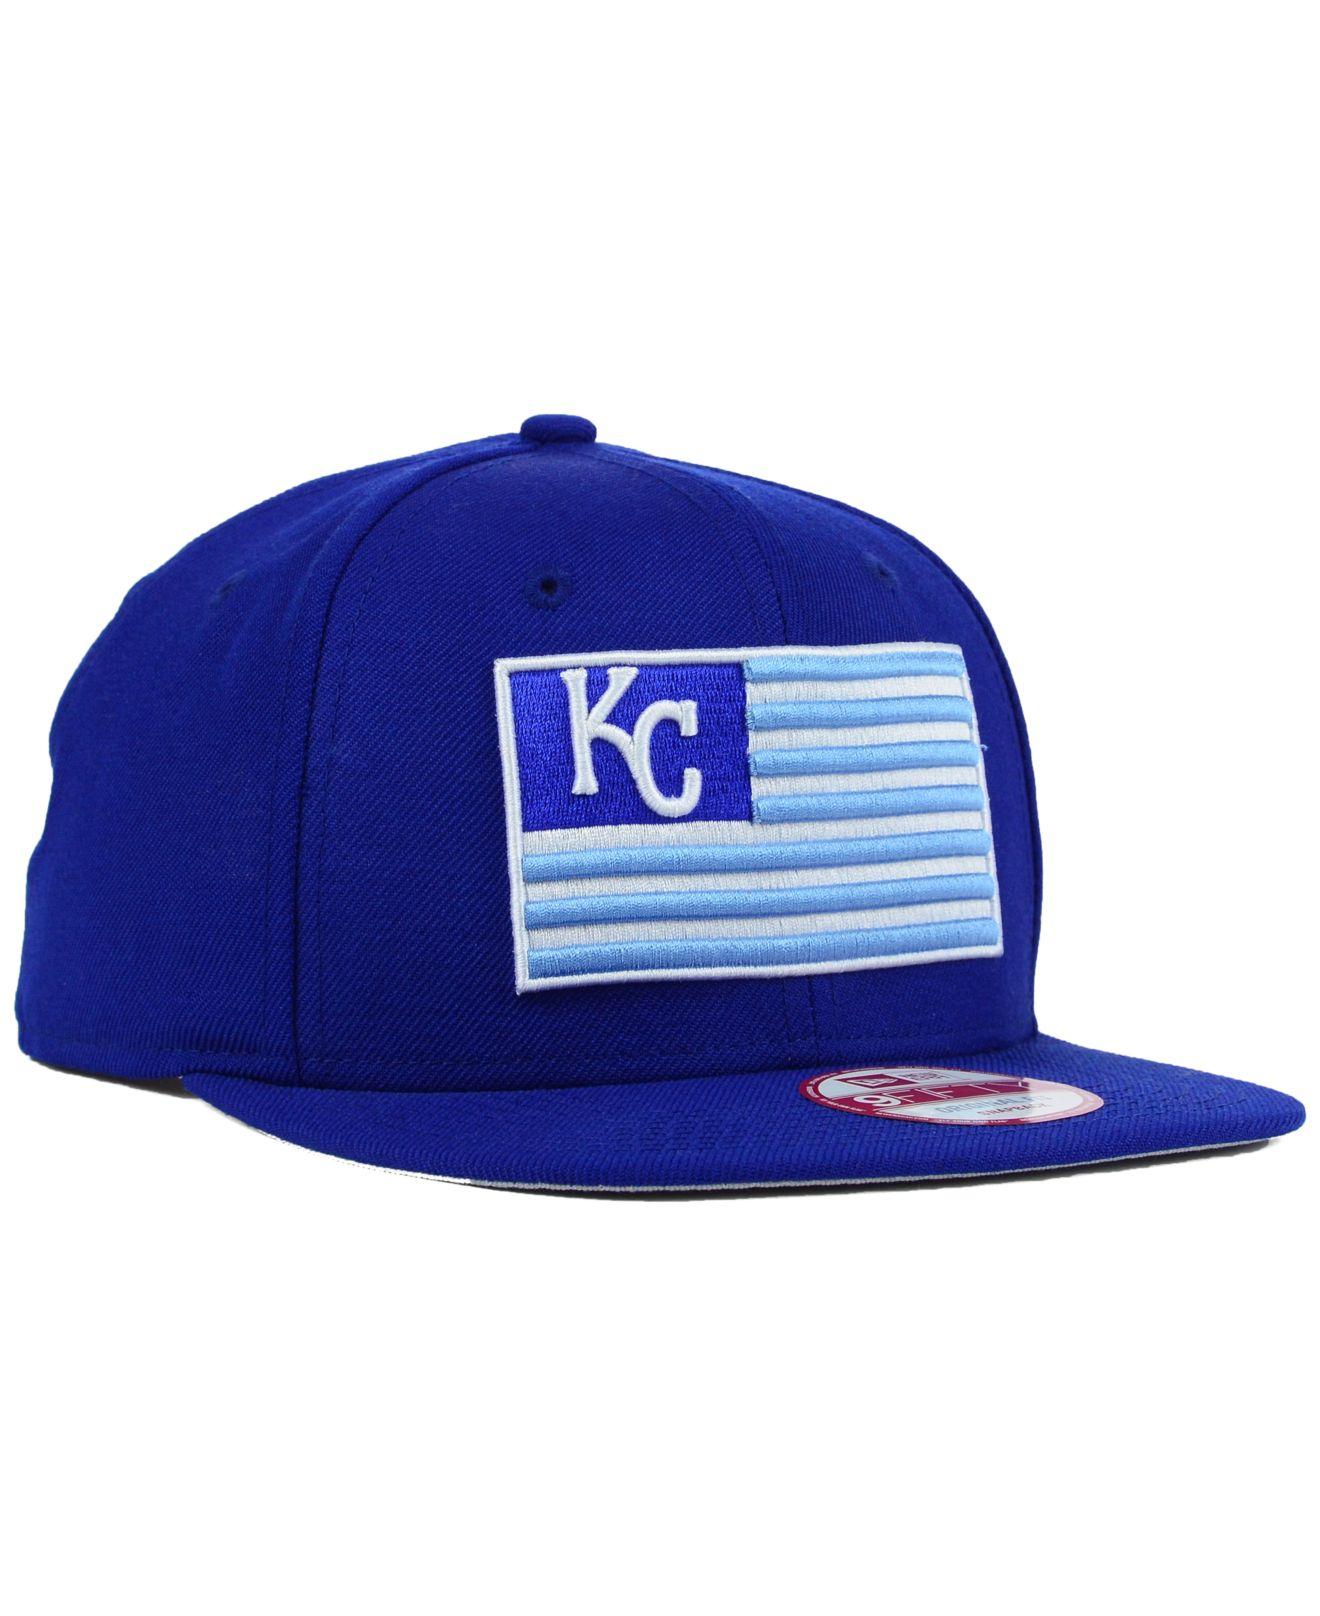 8b11f2f0f90 Lyst - KTZ Kansas City Royals Team Merica 9Fifty Snapback Cap in ...